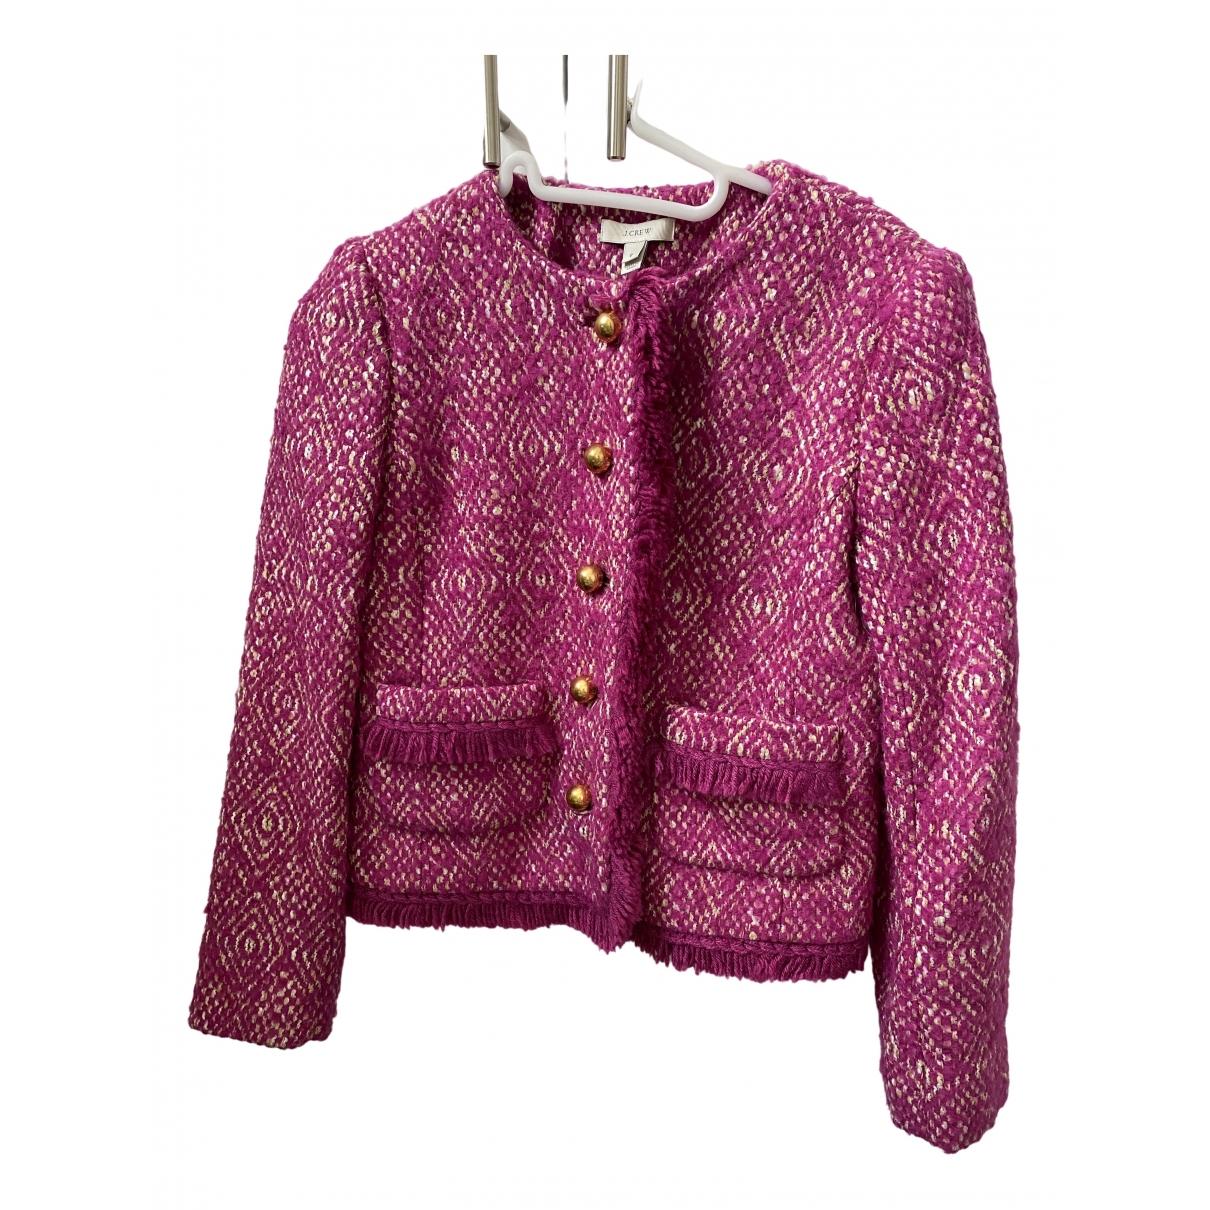 J.crew \N Pink Wool jacket for Women 1 US